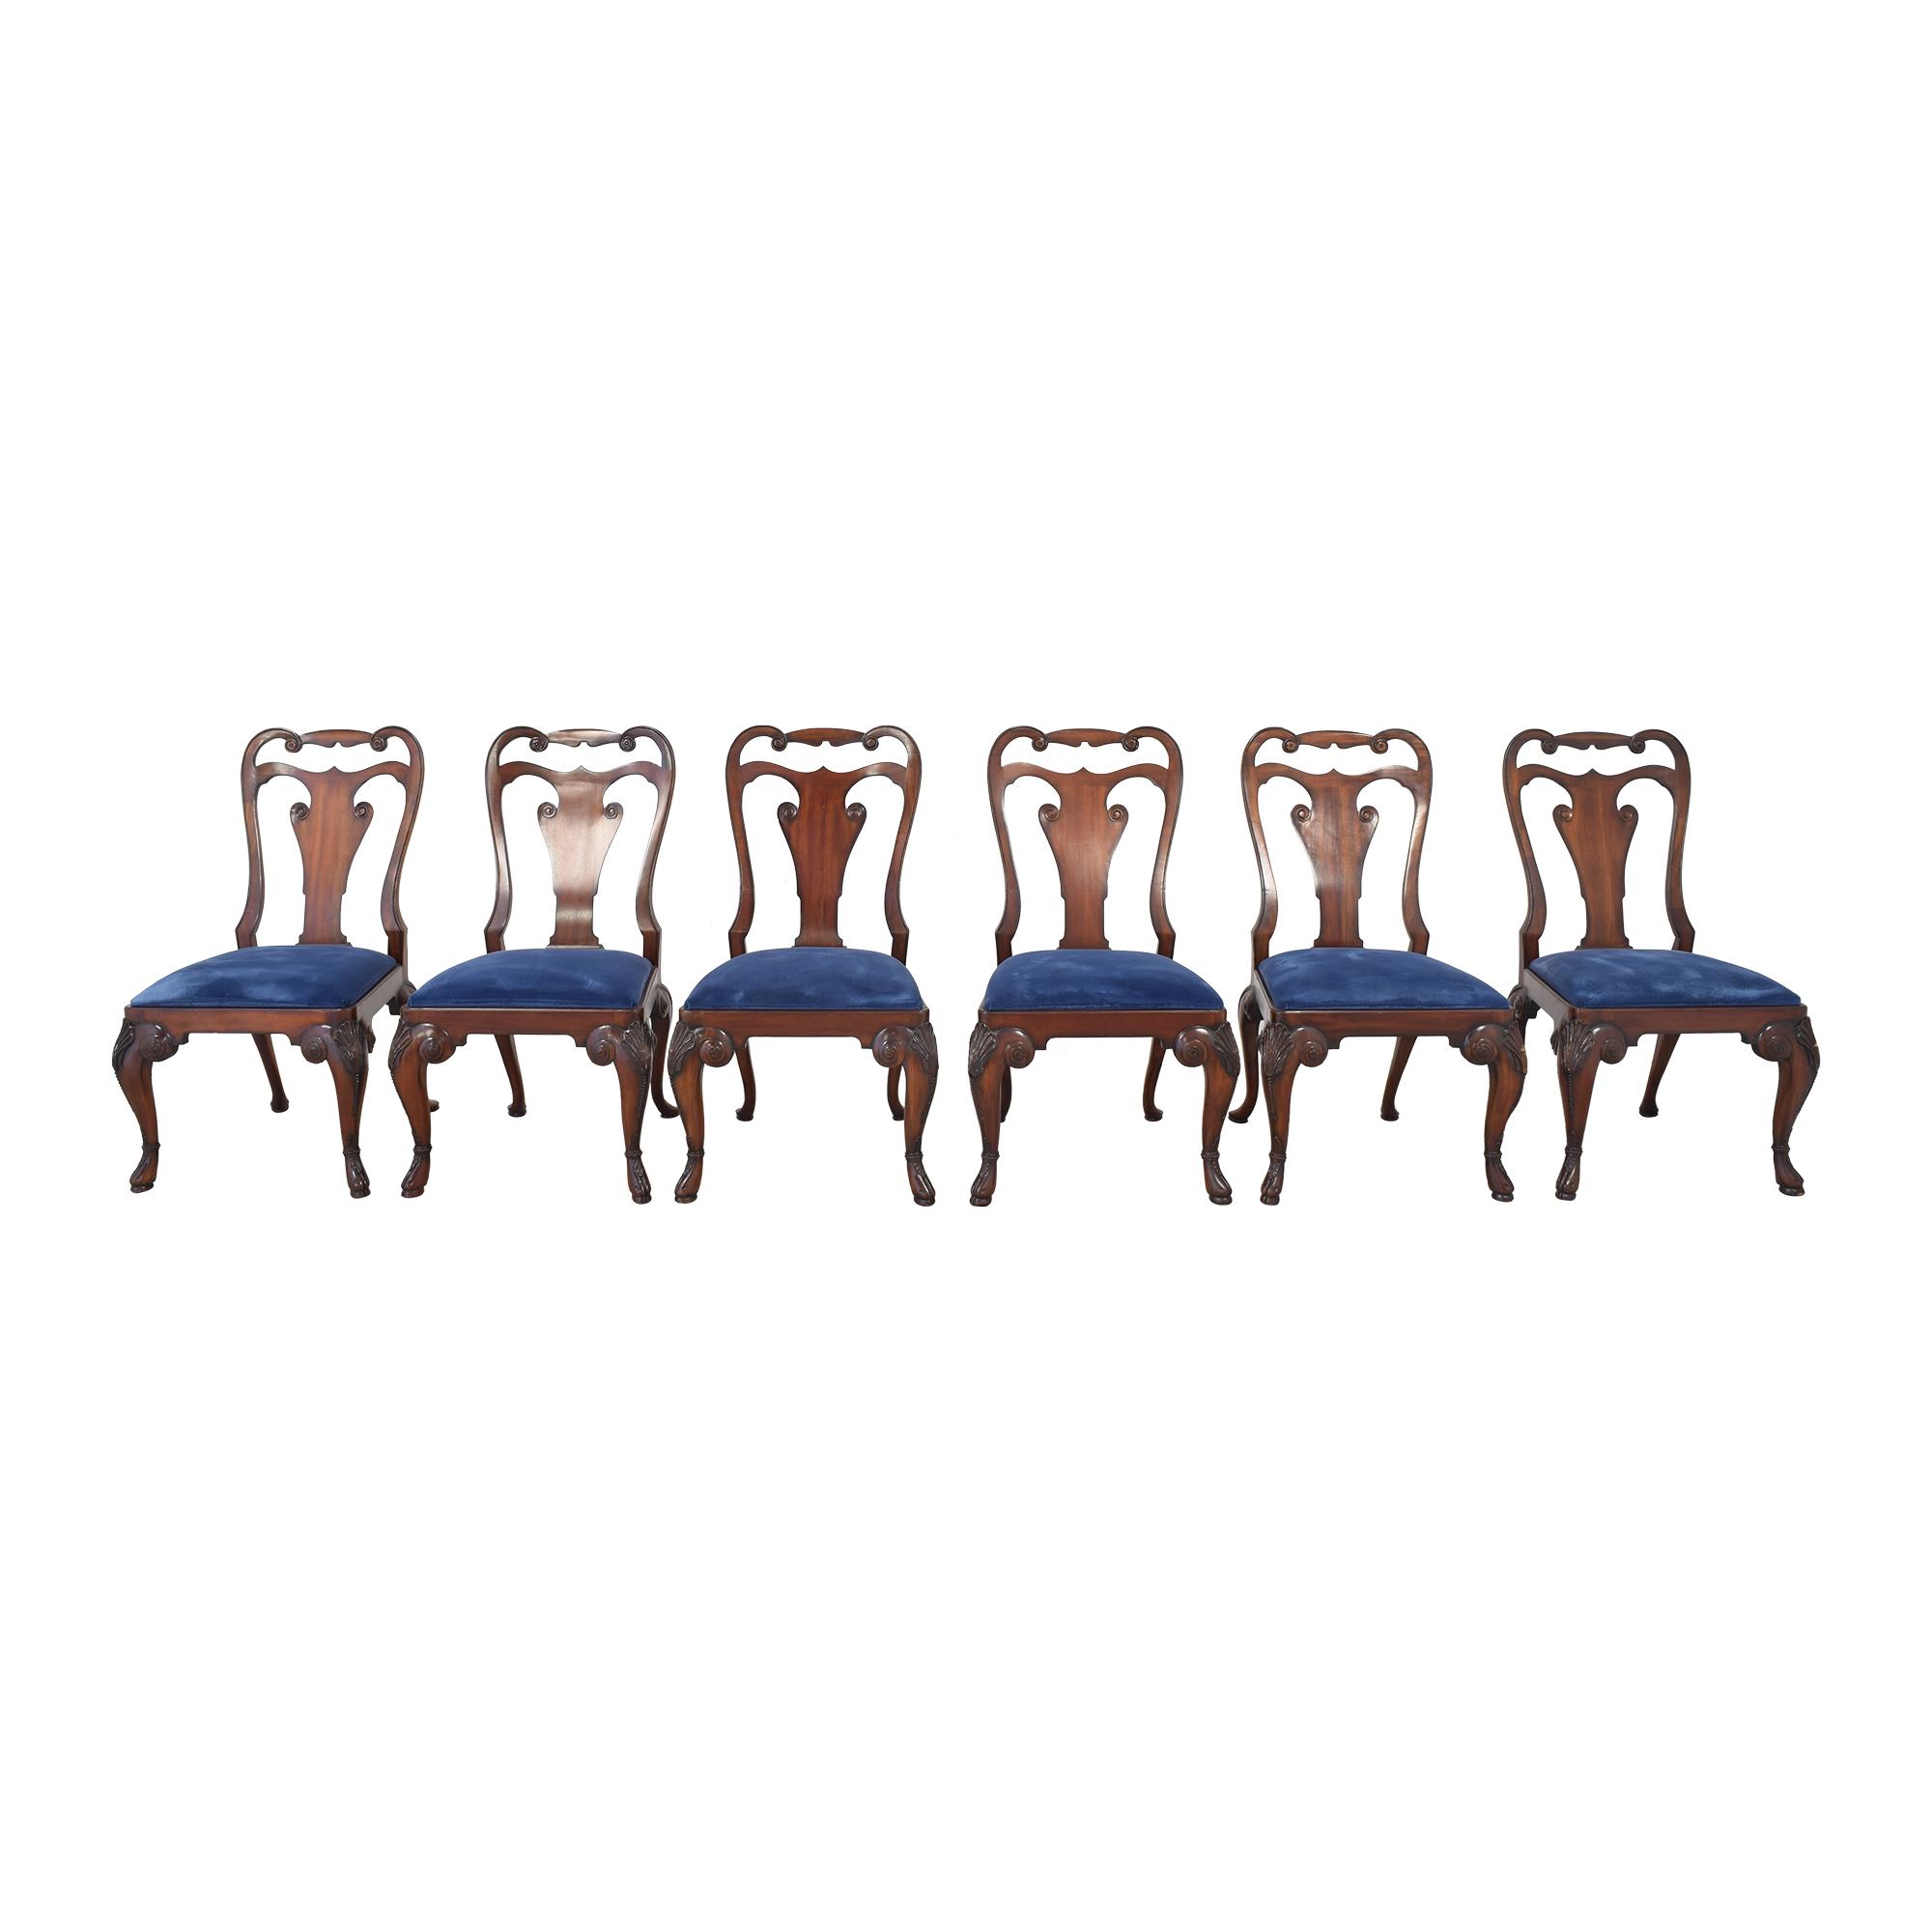 Ralph Lauren Beekman Dining Chairs / Chairs